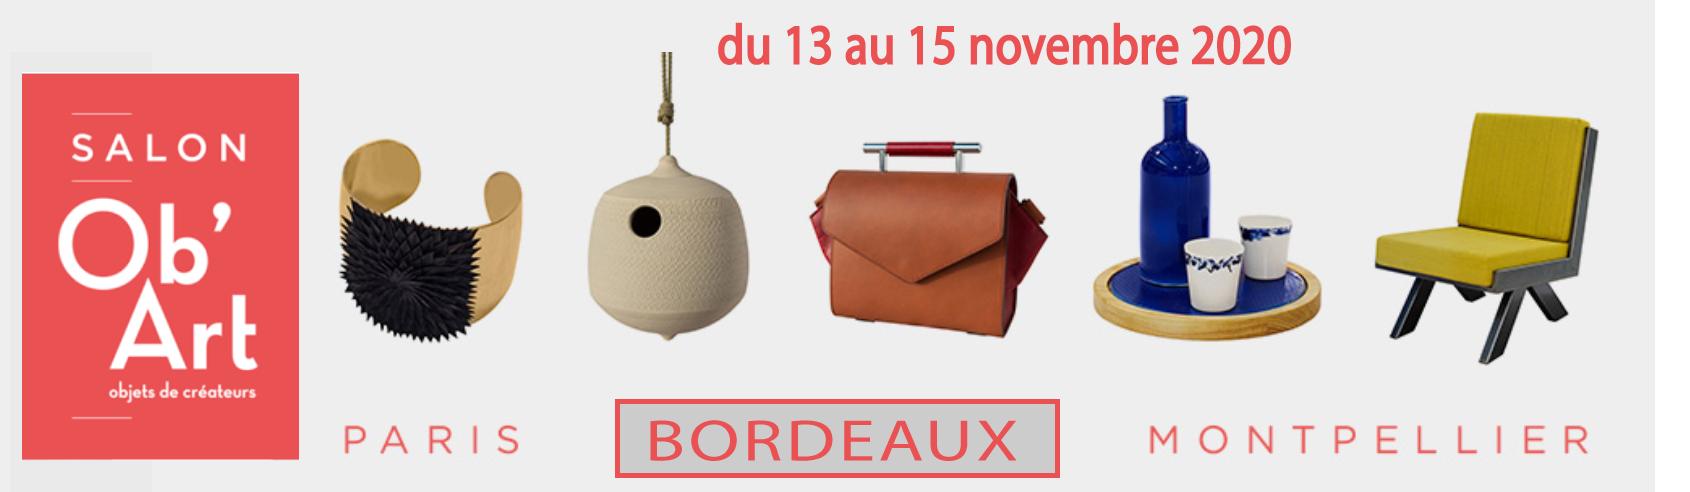 Salon Ob'art - Bordeaux